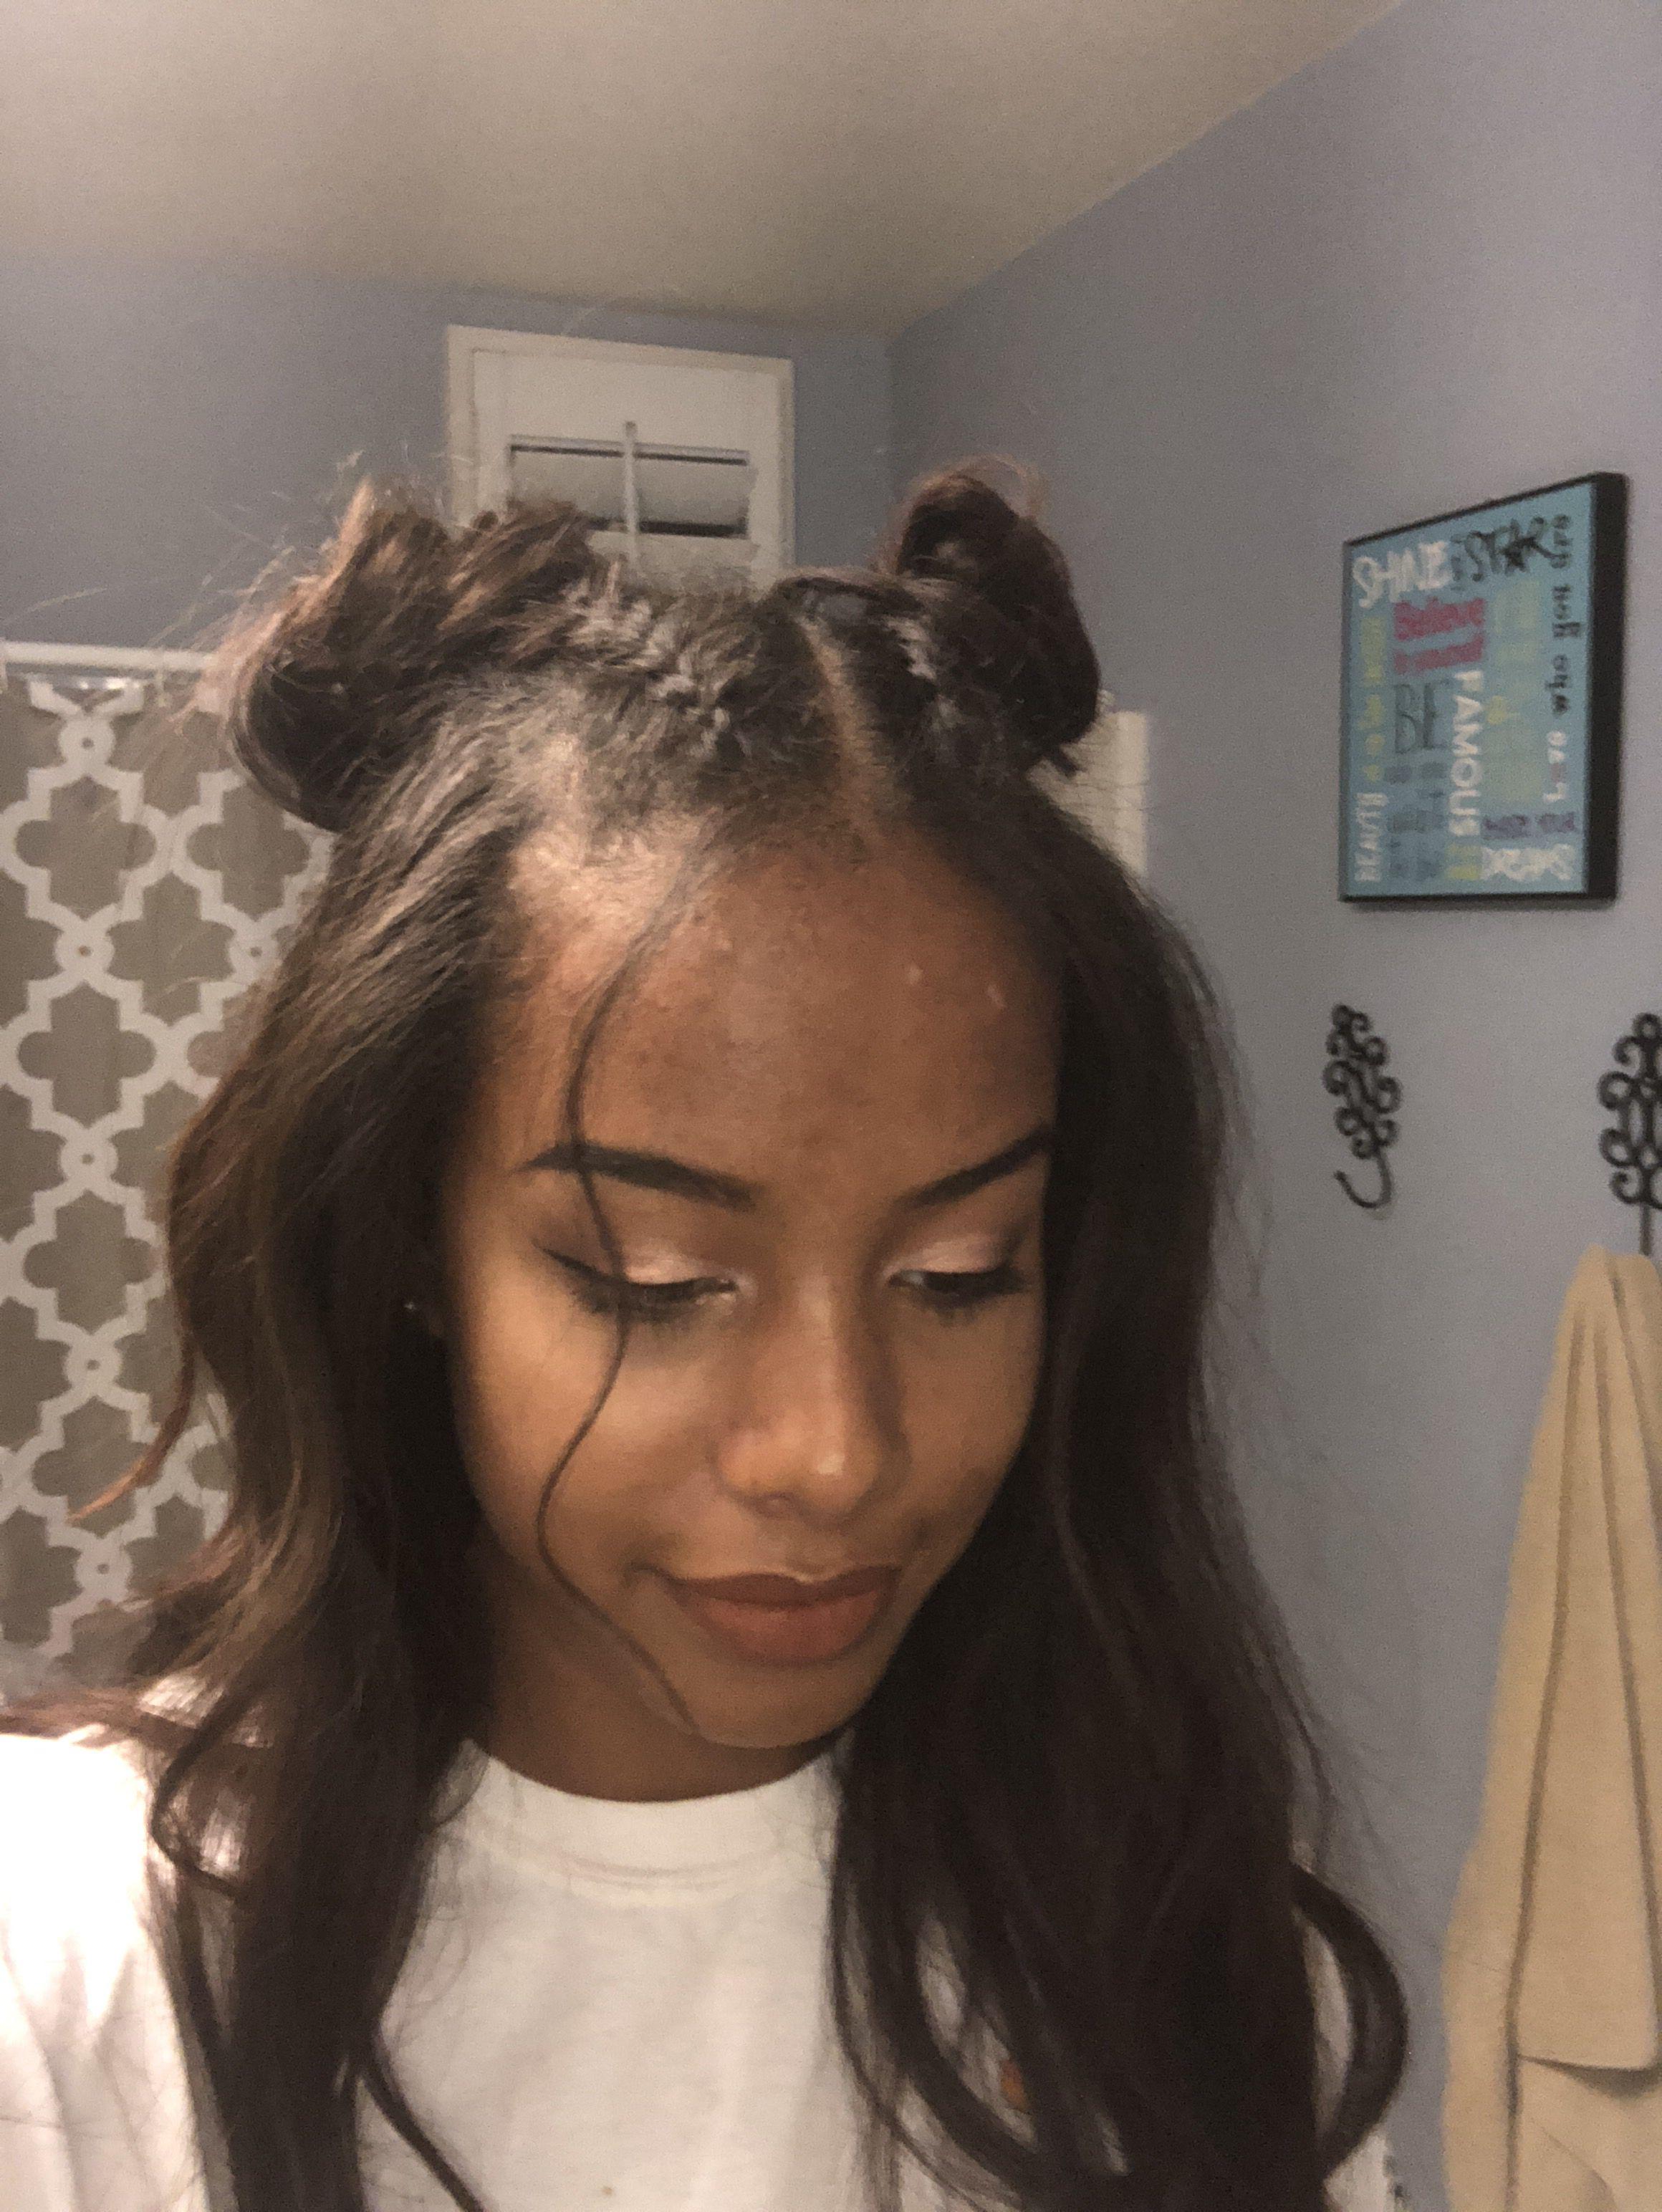 Double Bun Dutch Braid With Curled Hair Half Up Half Down Half Up Hair Hairstyles With Curled Hair Half Up Curls